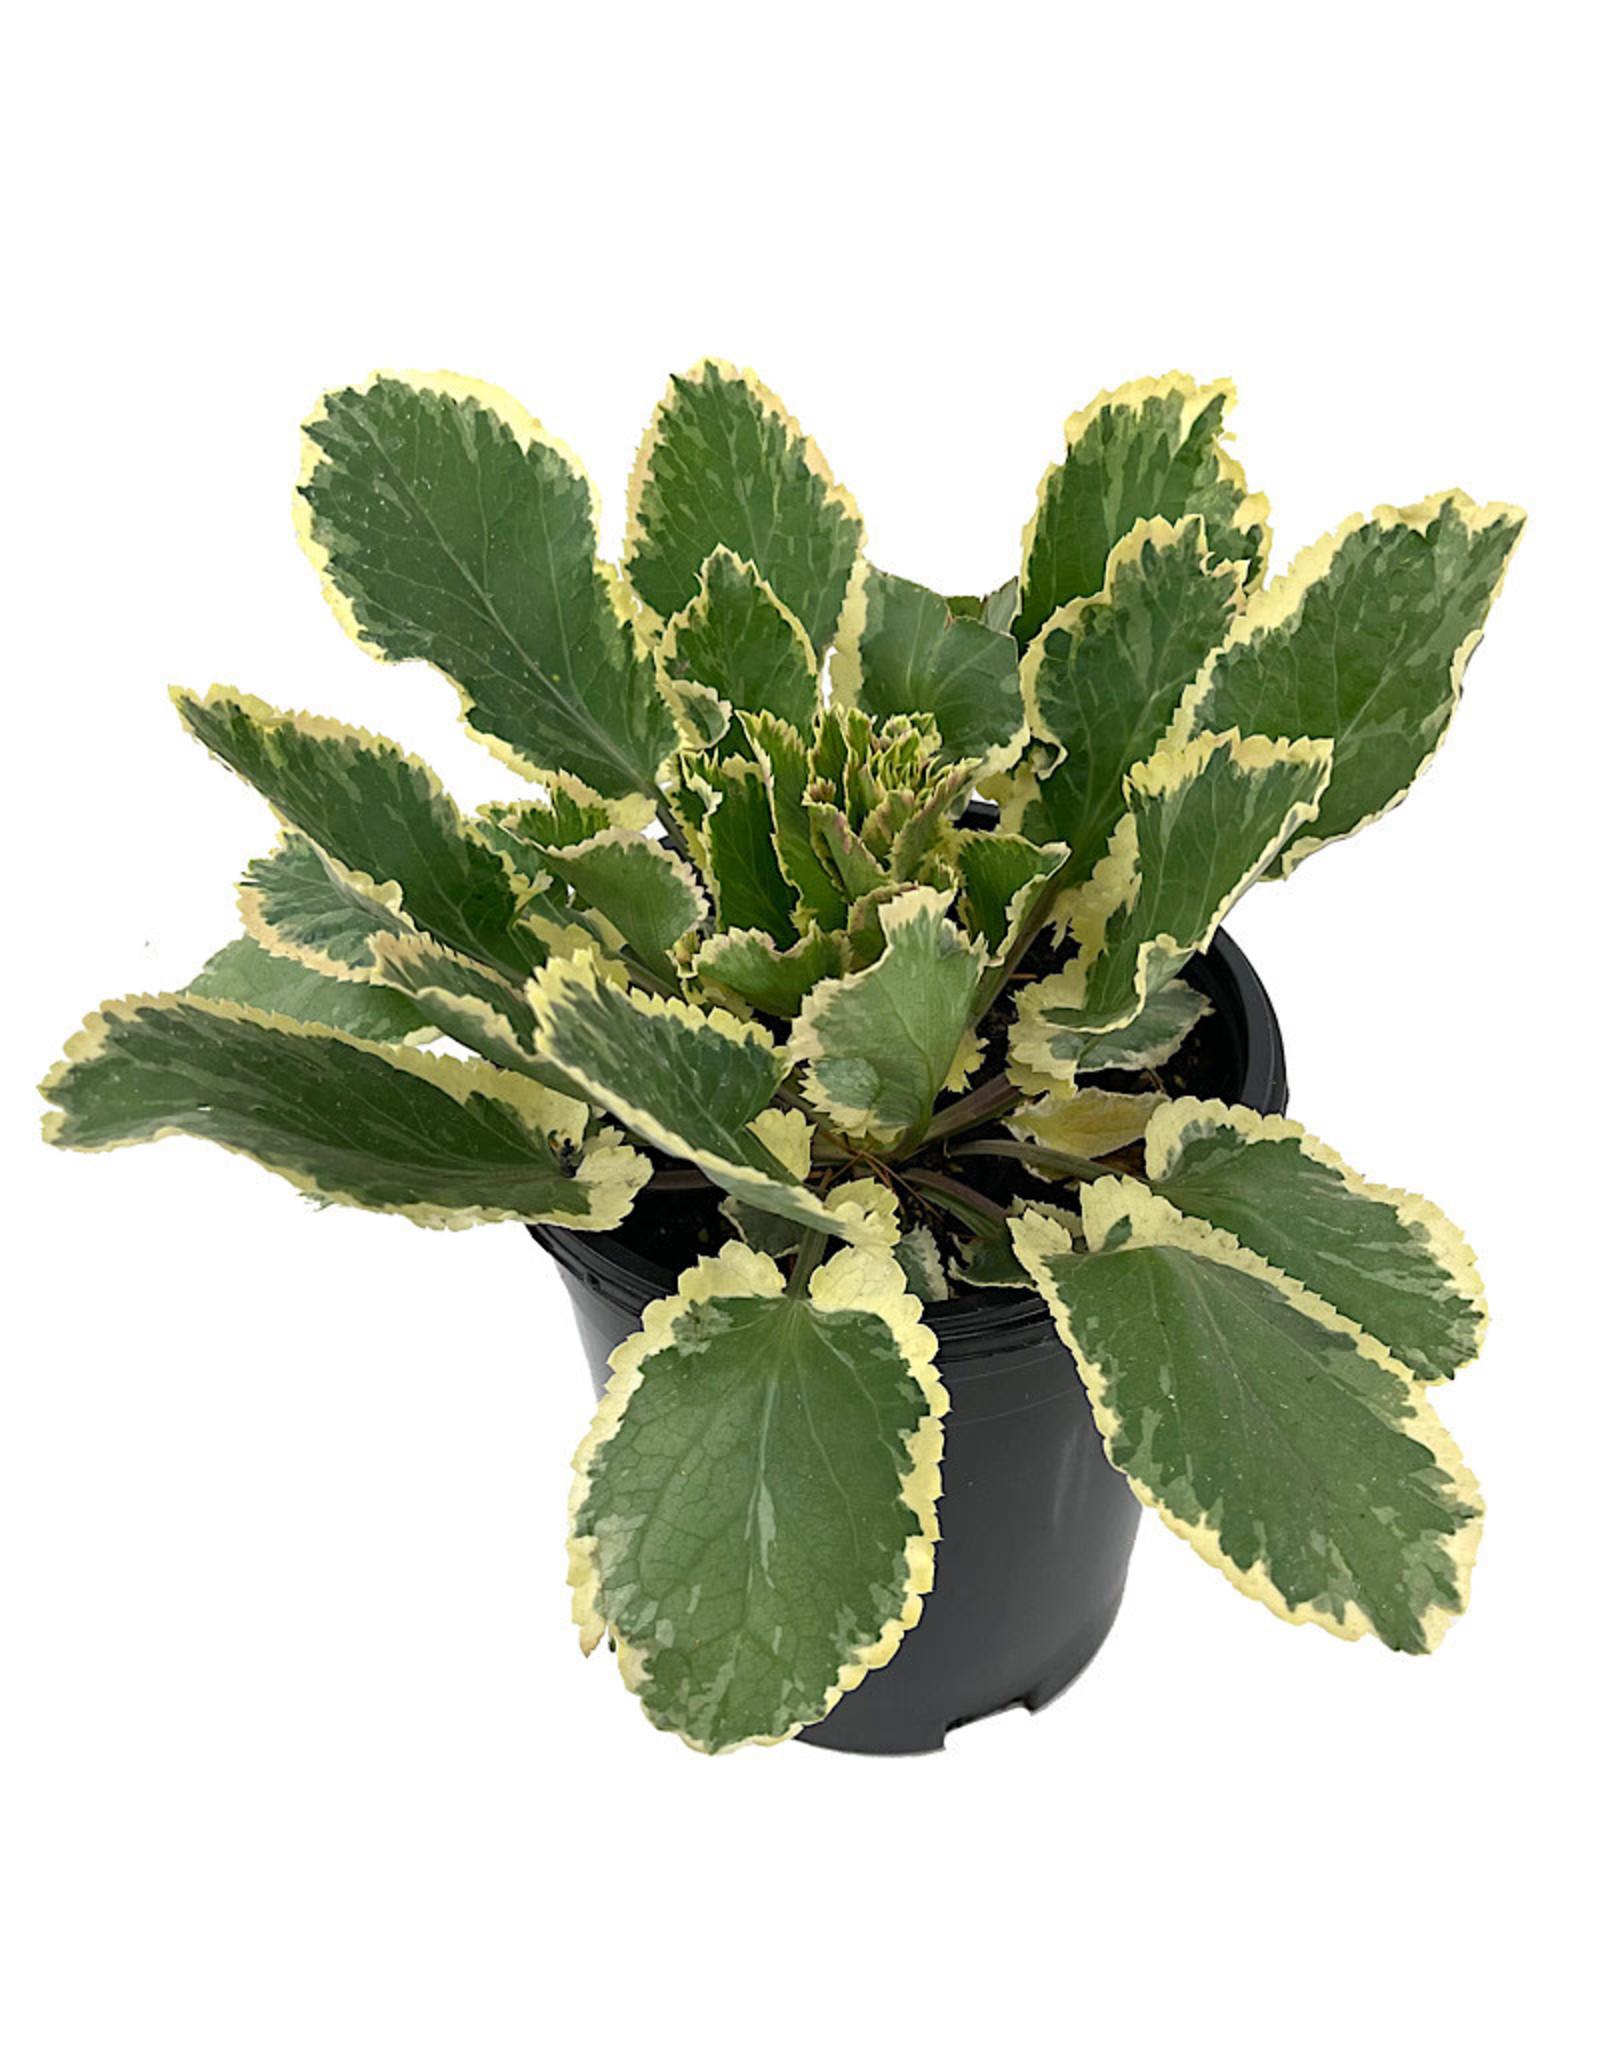 Eryngium 'Jade Frost' 1 Gallon